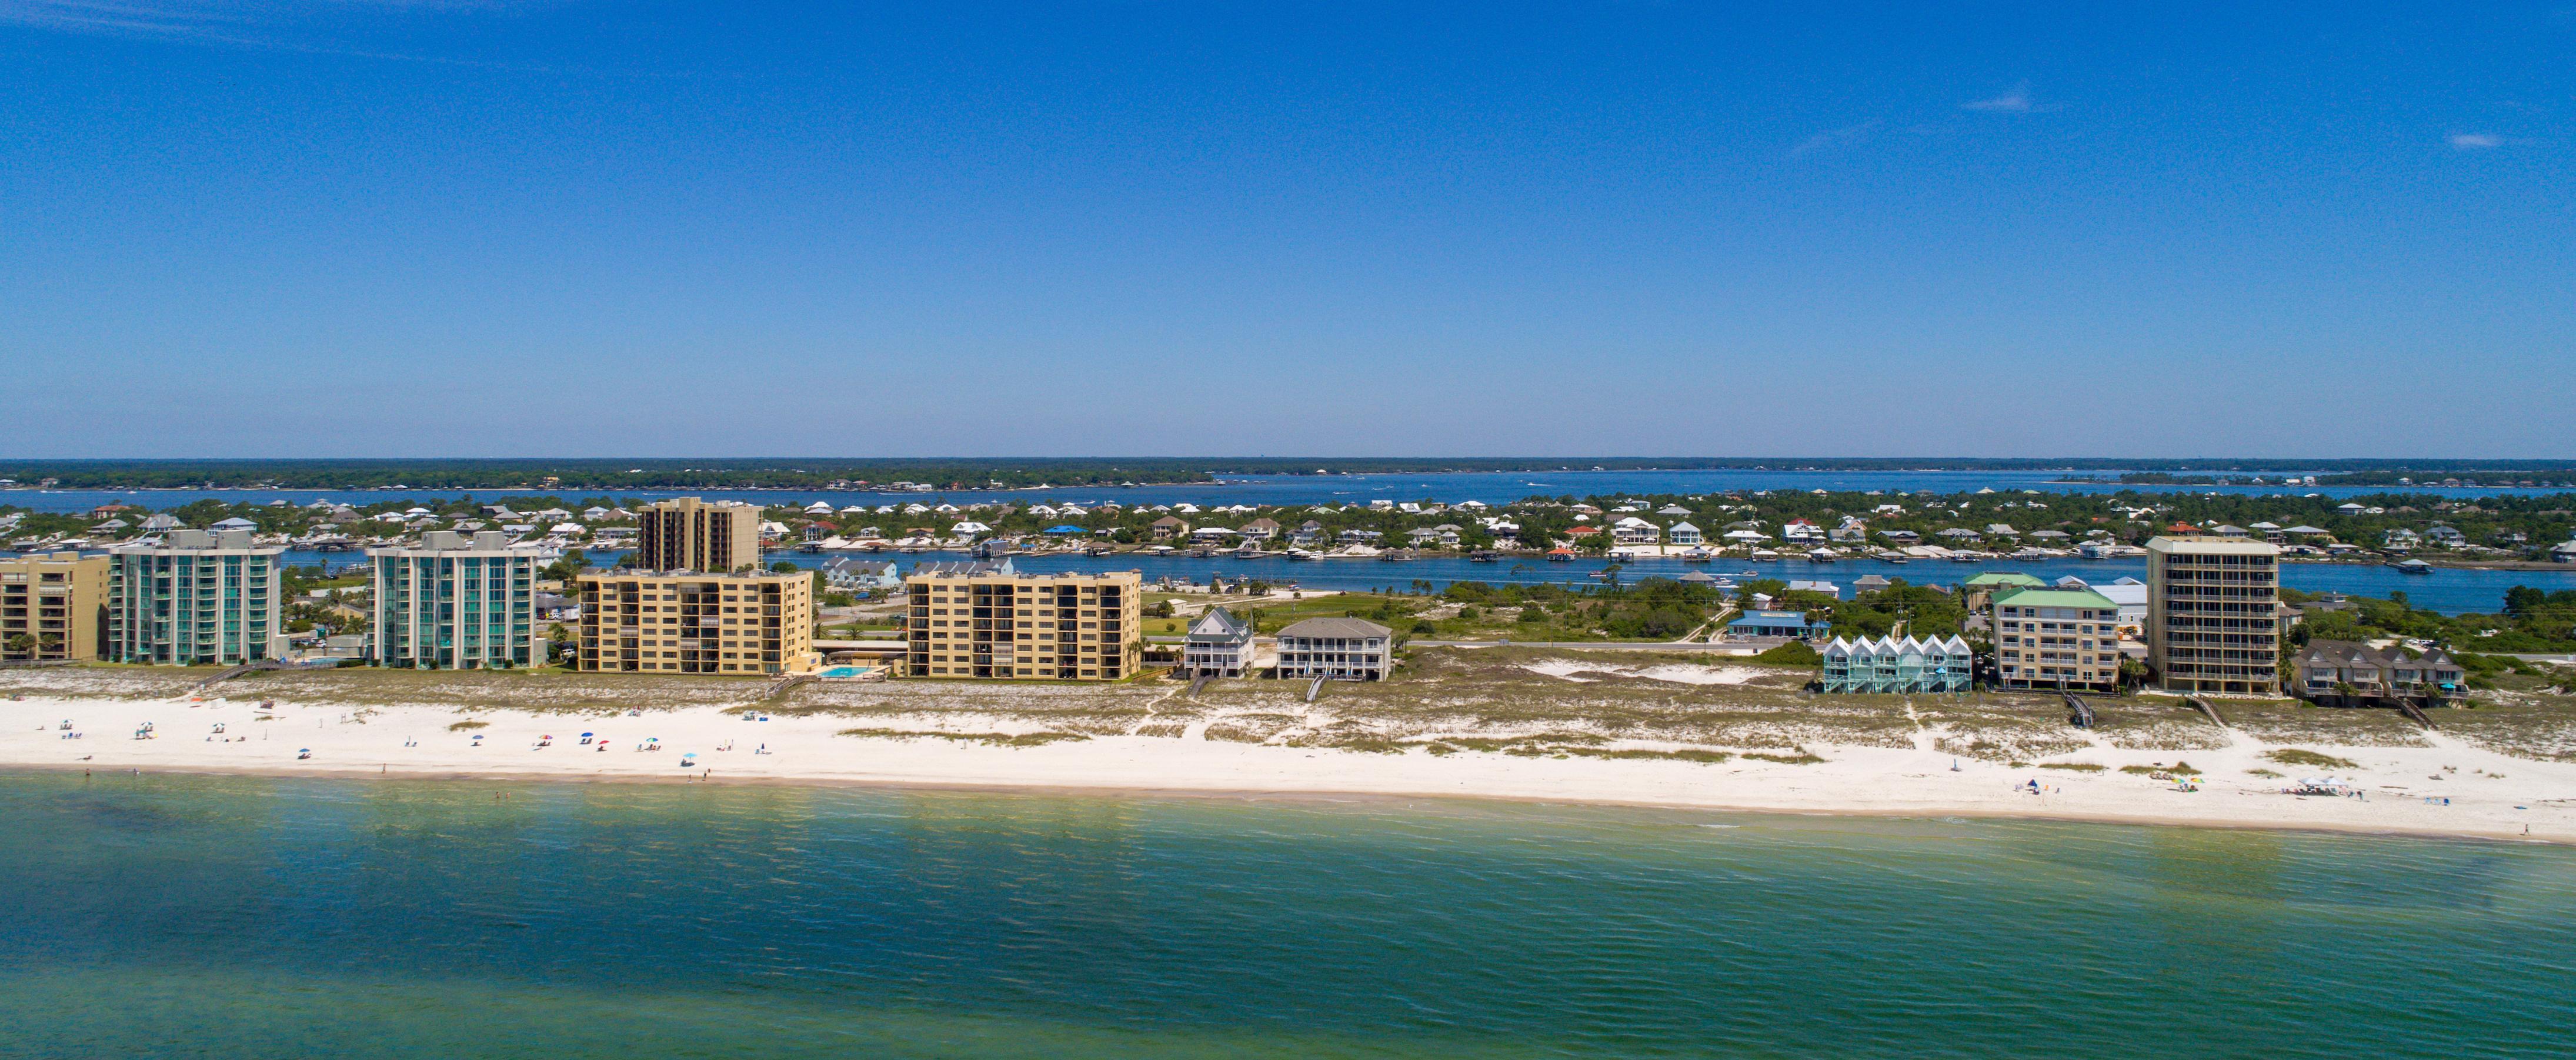 Panoramic view of Pensacola, Florida and the beach.